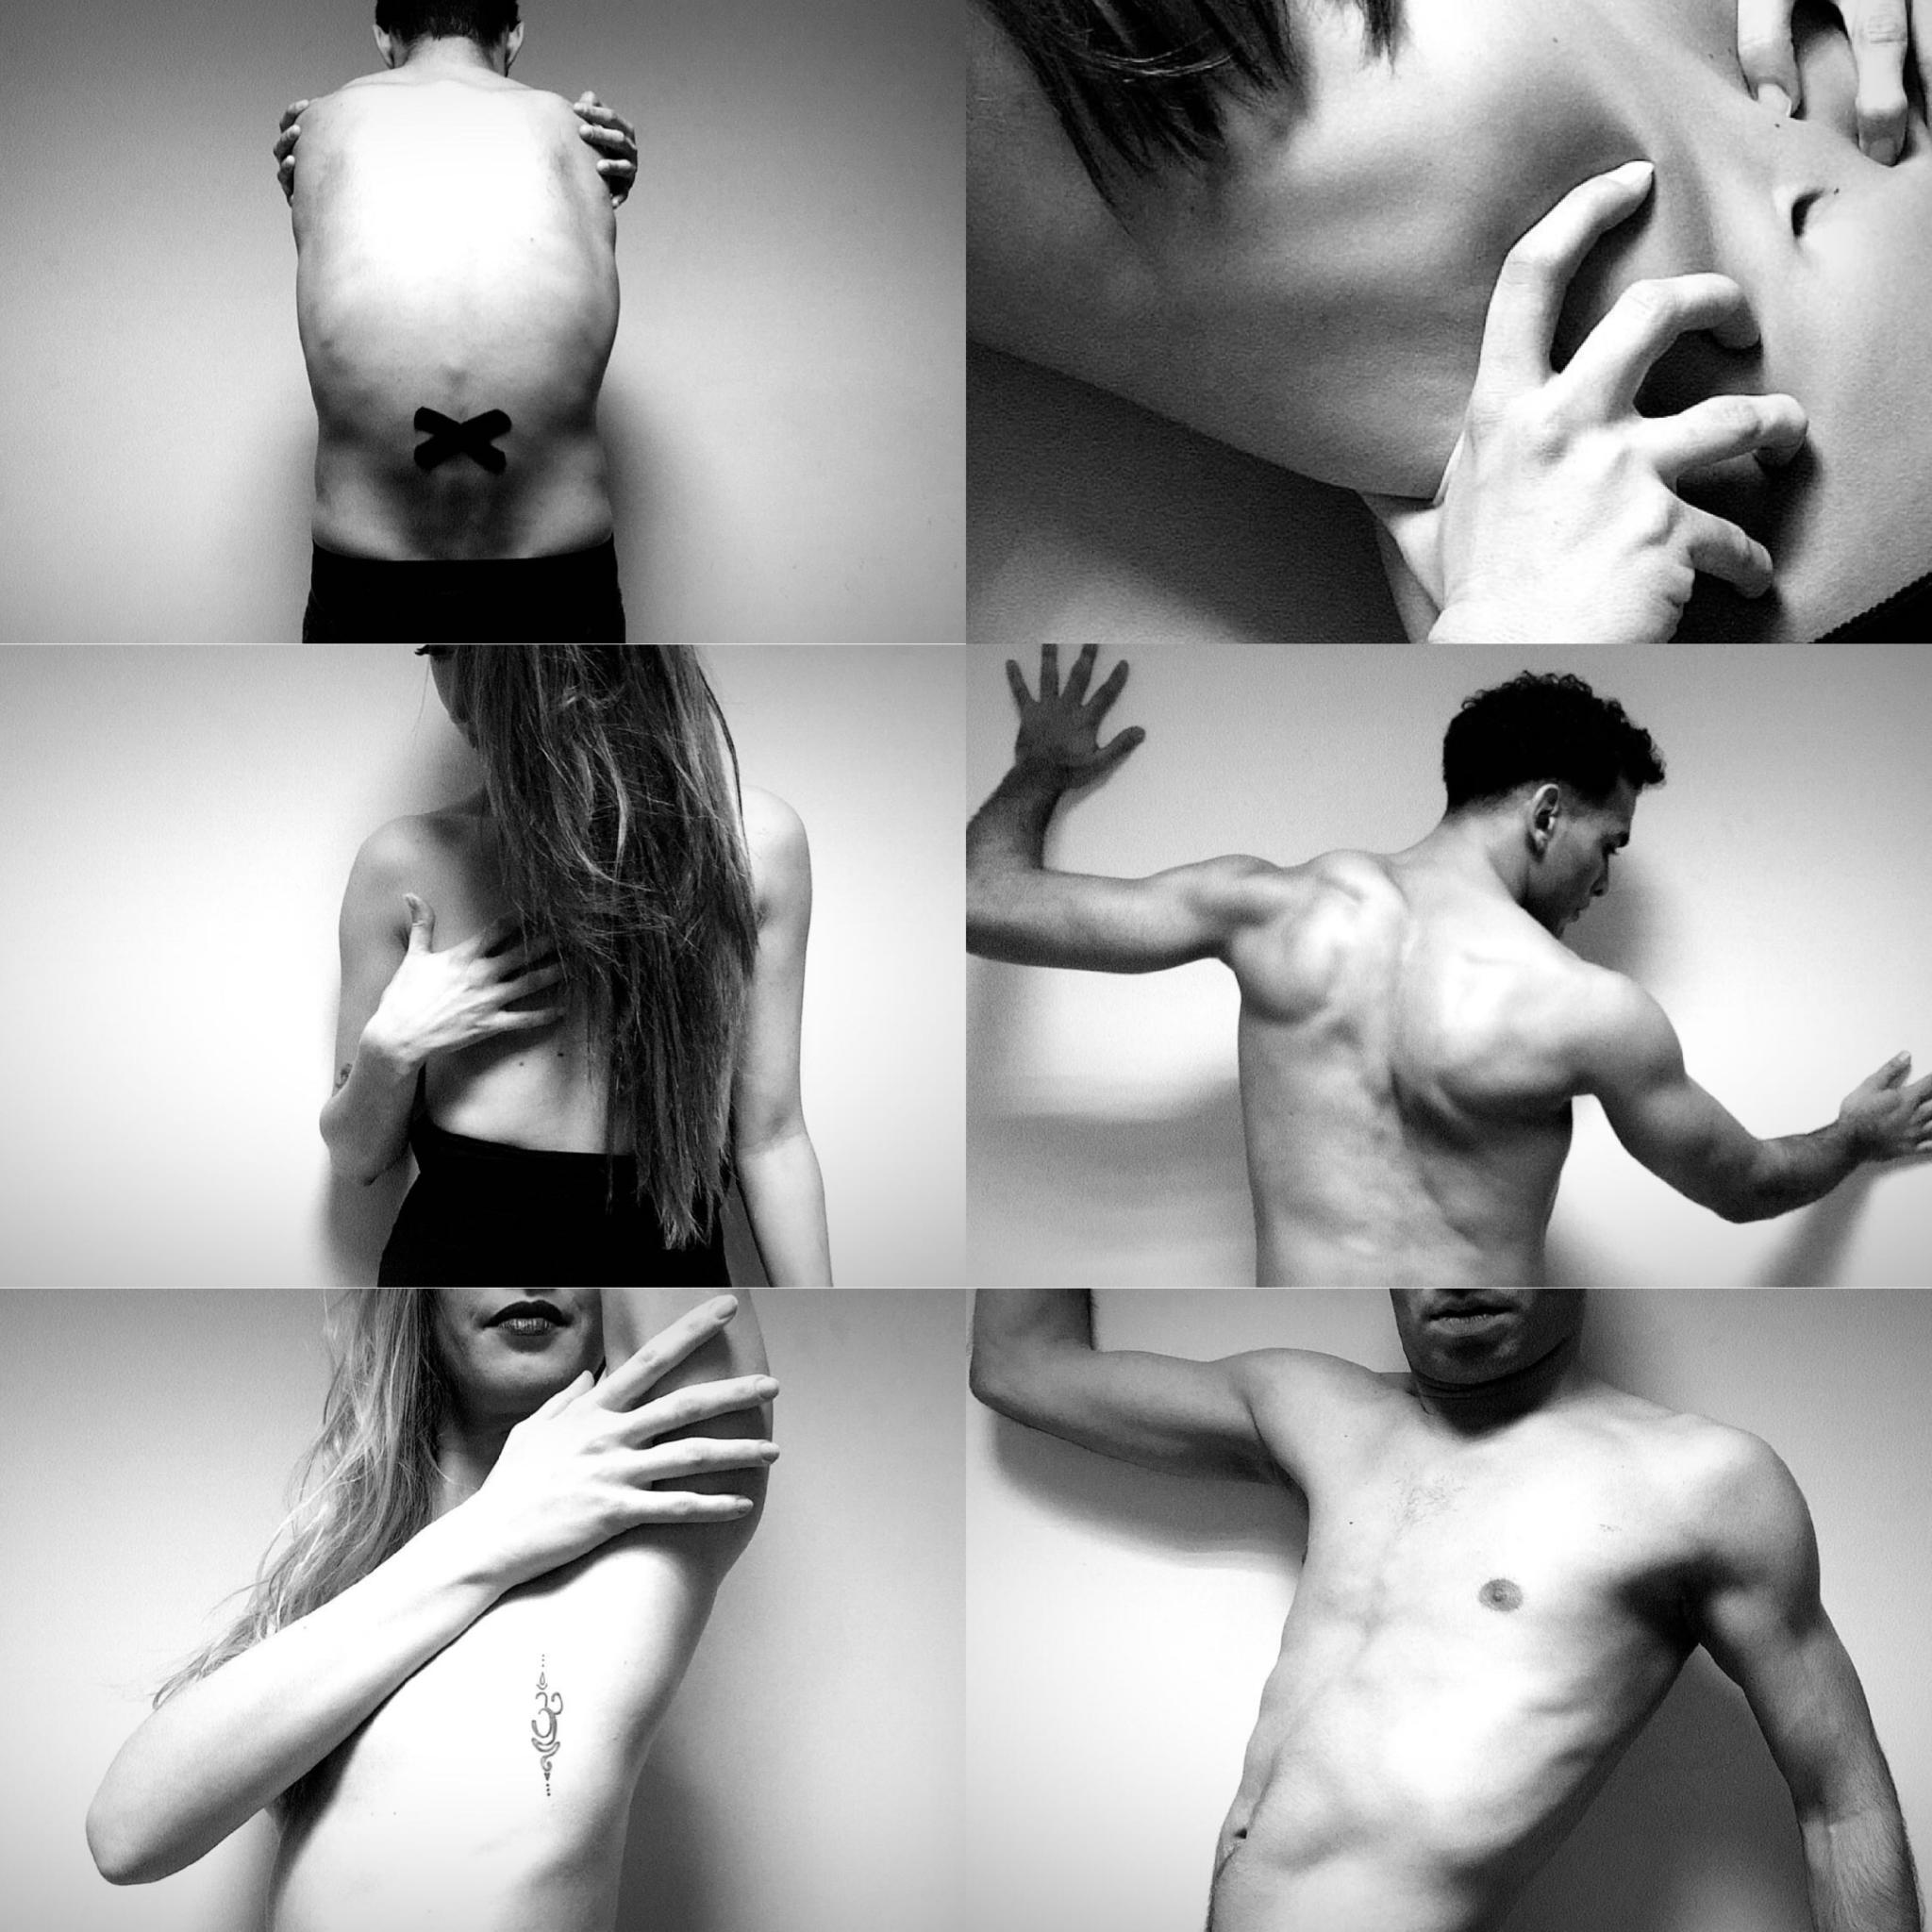 Mon corps, Mon amour. Aimer son corps: vos histoires.